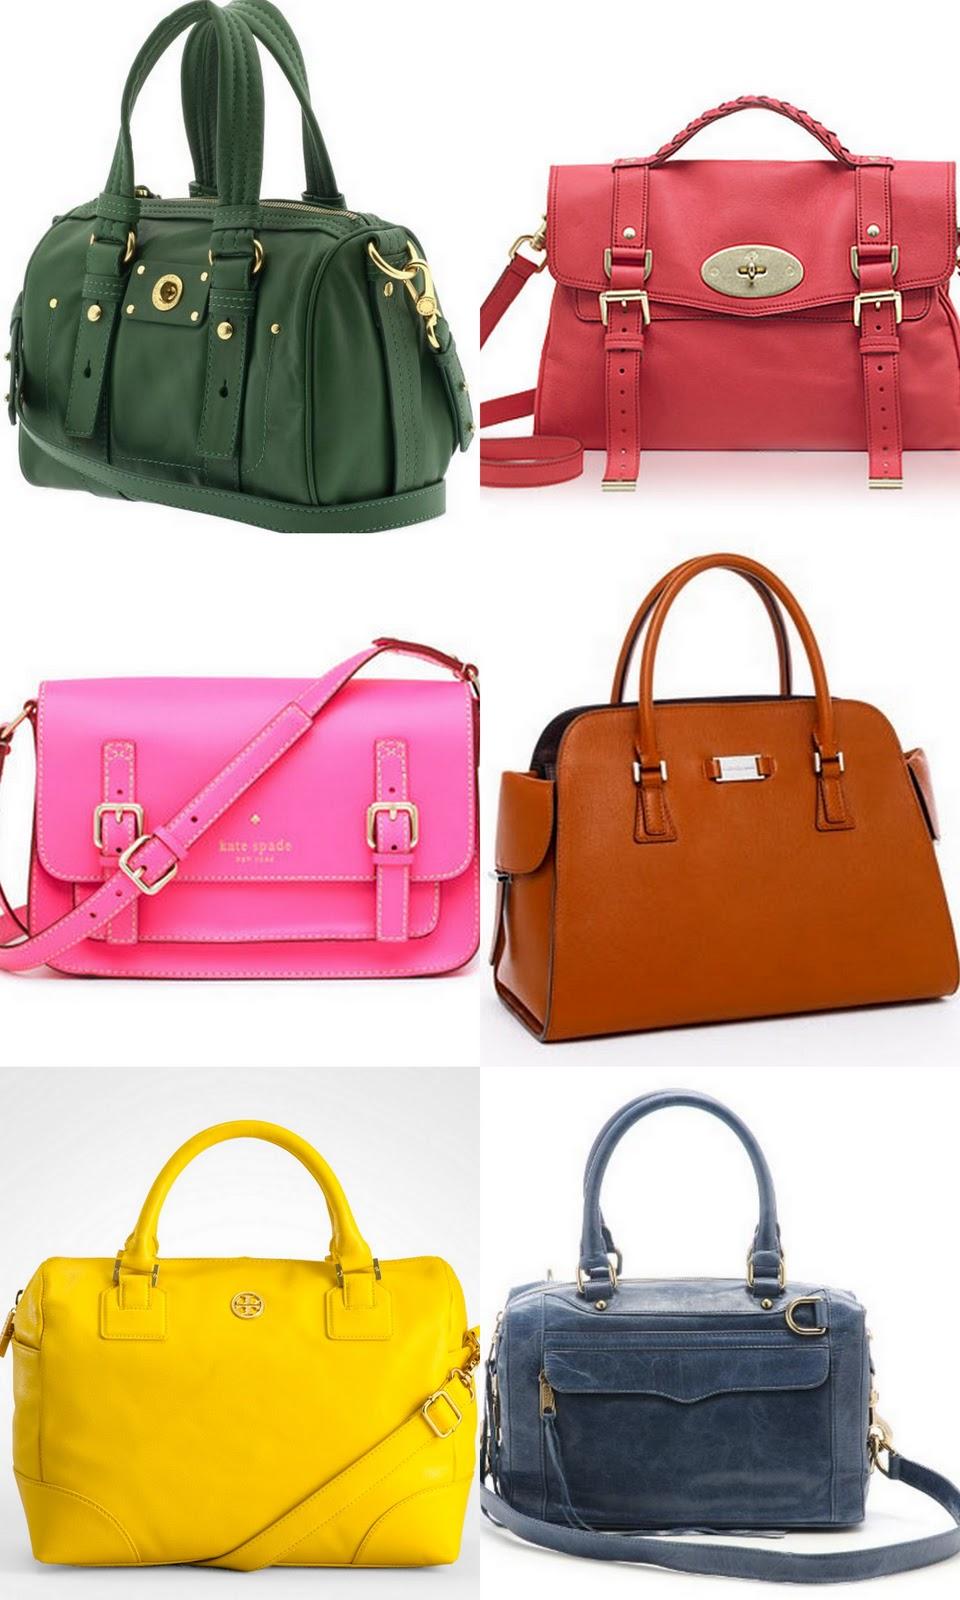 Naina Singla - fashion stylist and style expert - Blog - Spring 2011 Trend  Colorful  Handbags 4fbb19cb95ce5